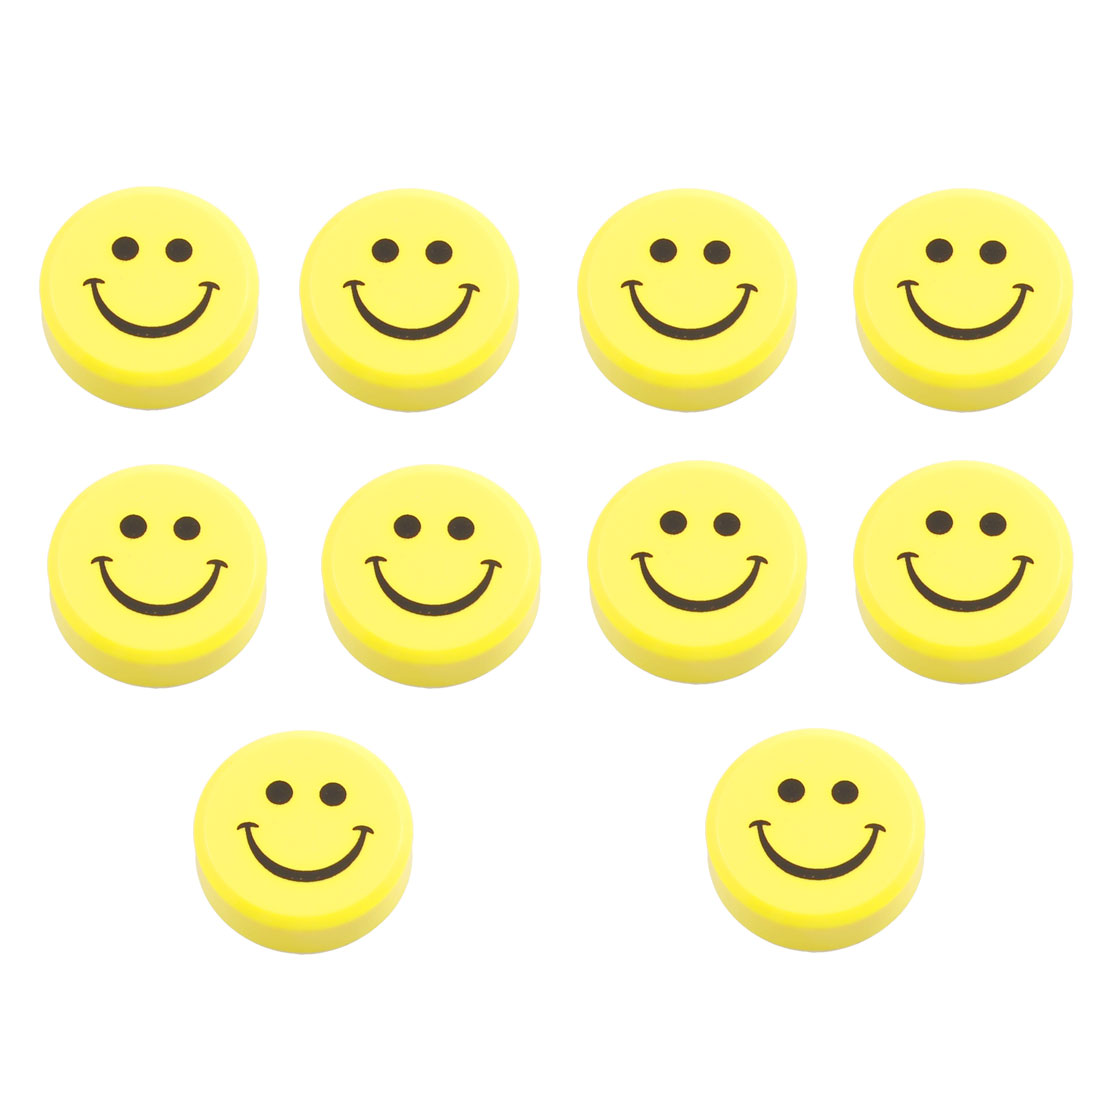 "10 x 1.2"" Dia Smile Face Pattern Yellow Shell Fridge Magnets Home Decor"